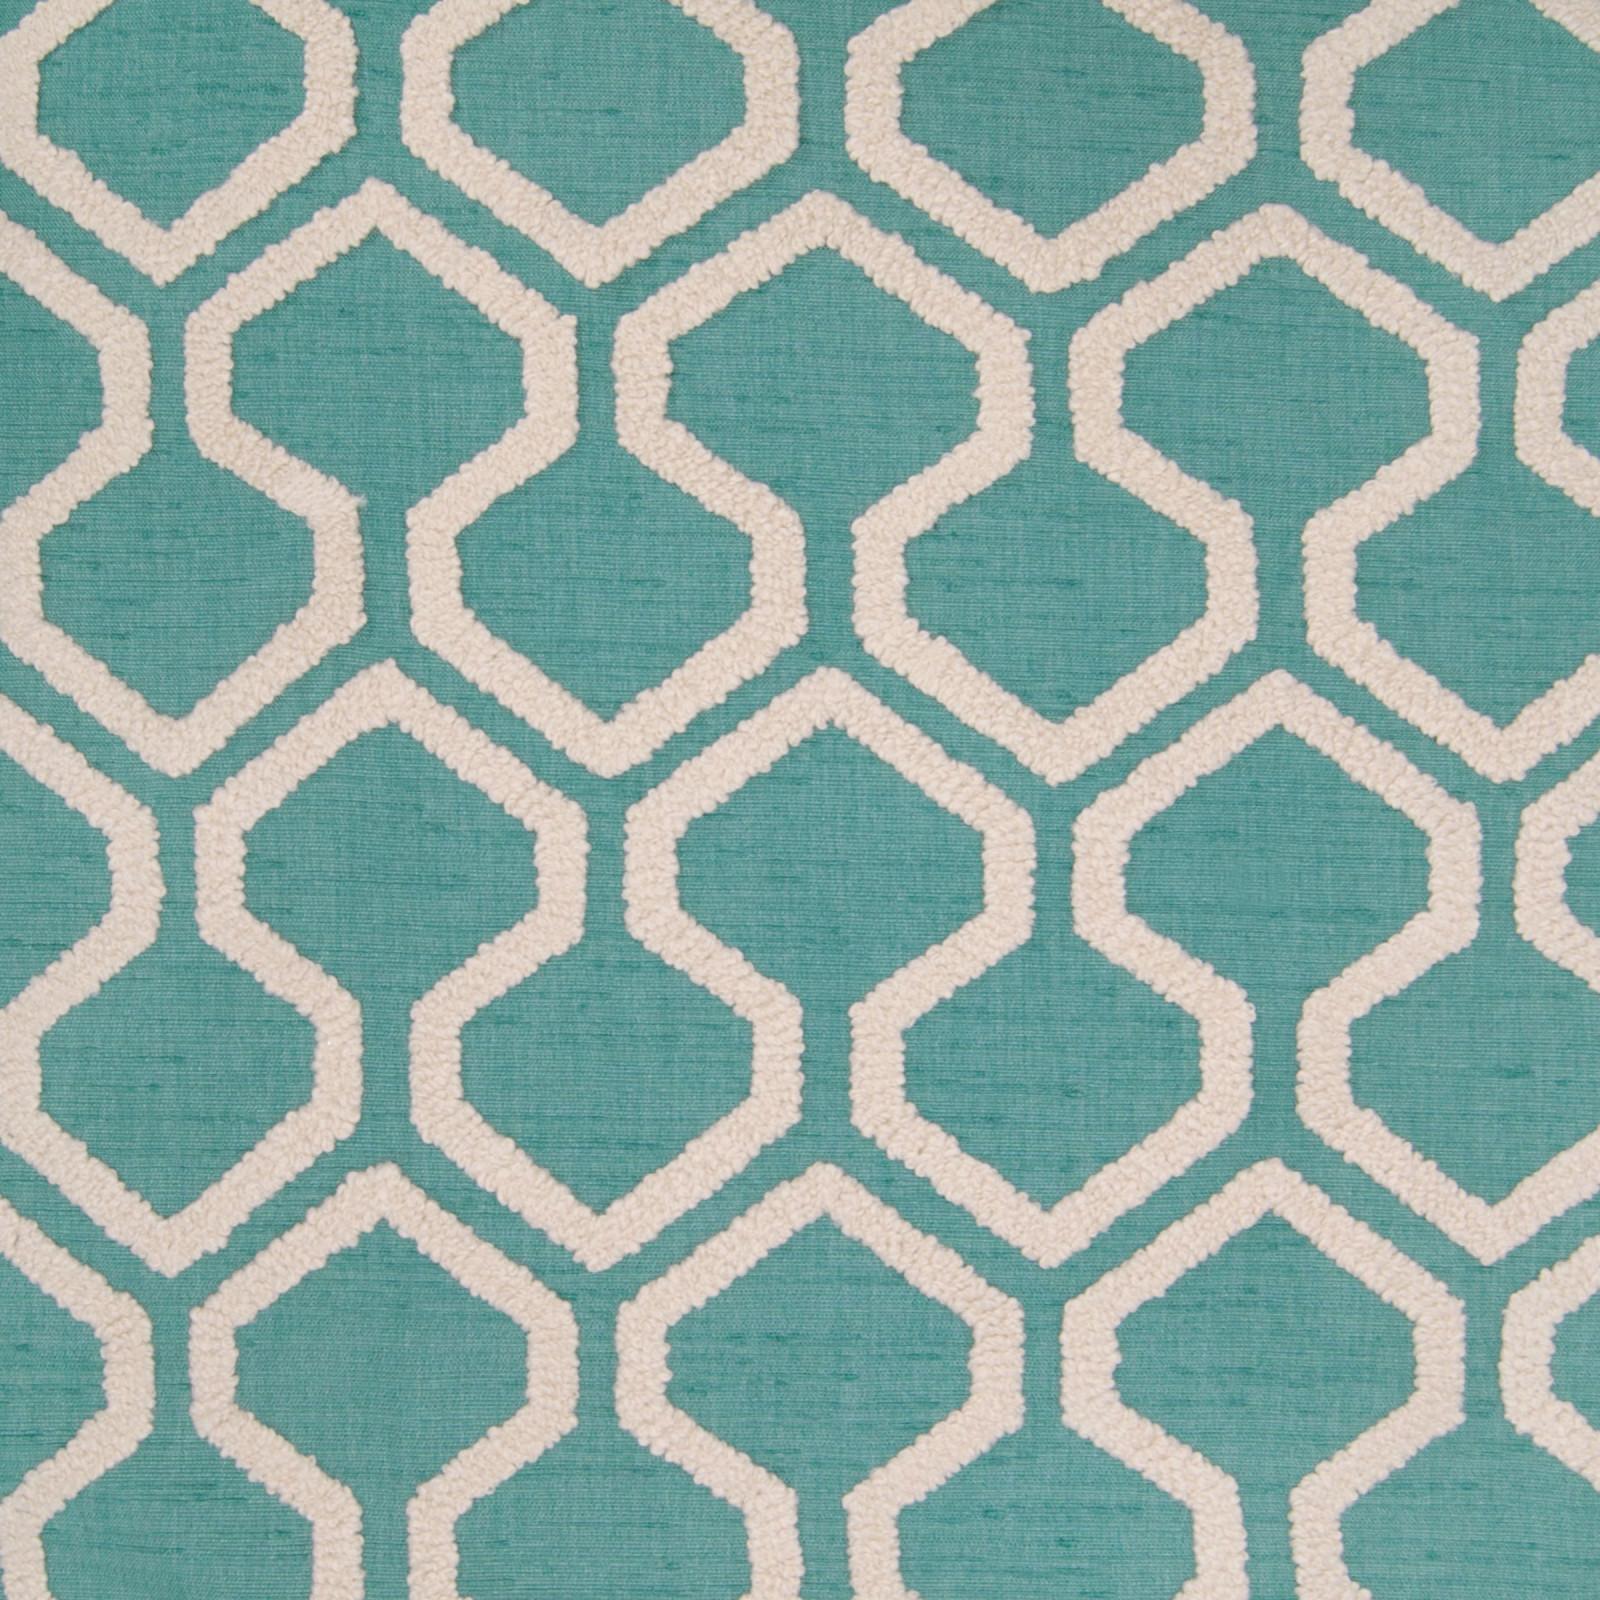 B5075 Peacock Greenhouse Fabrics